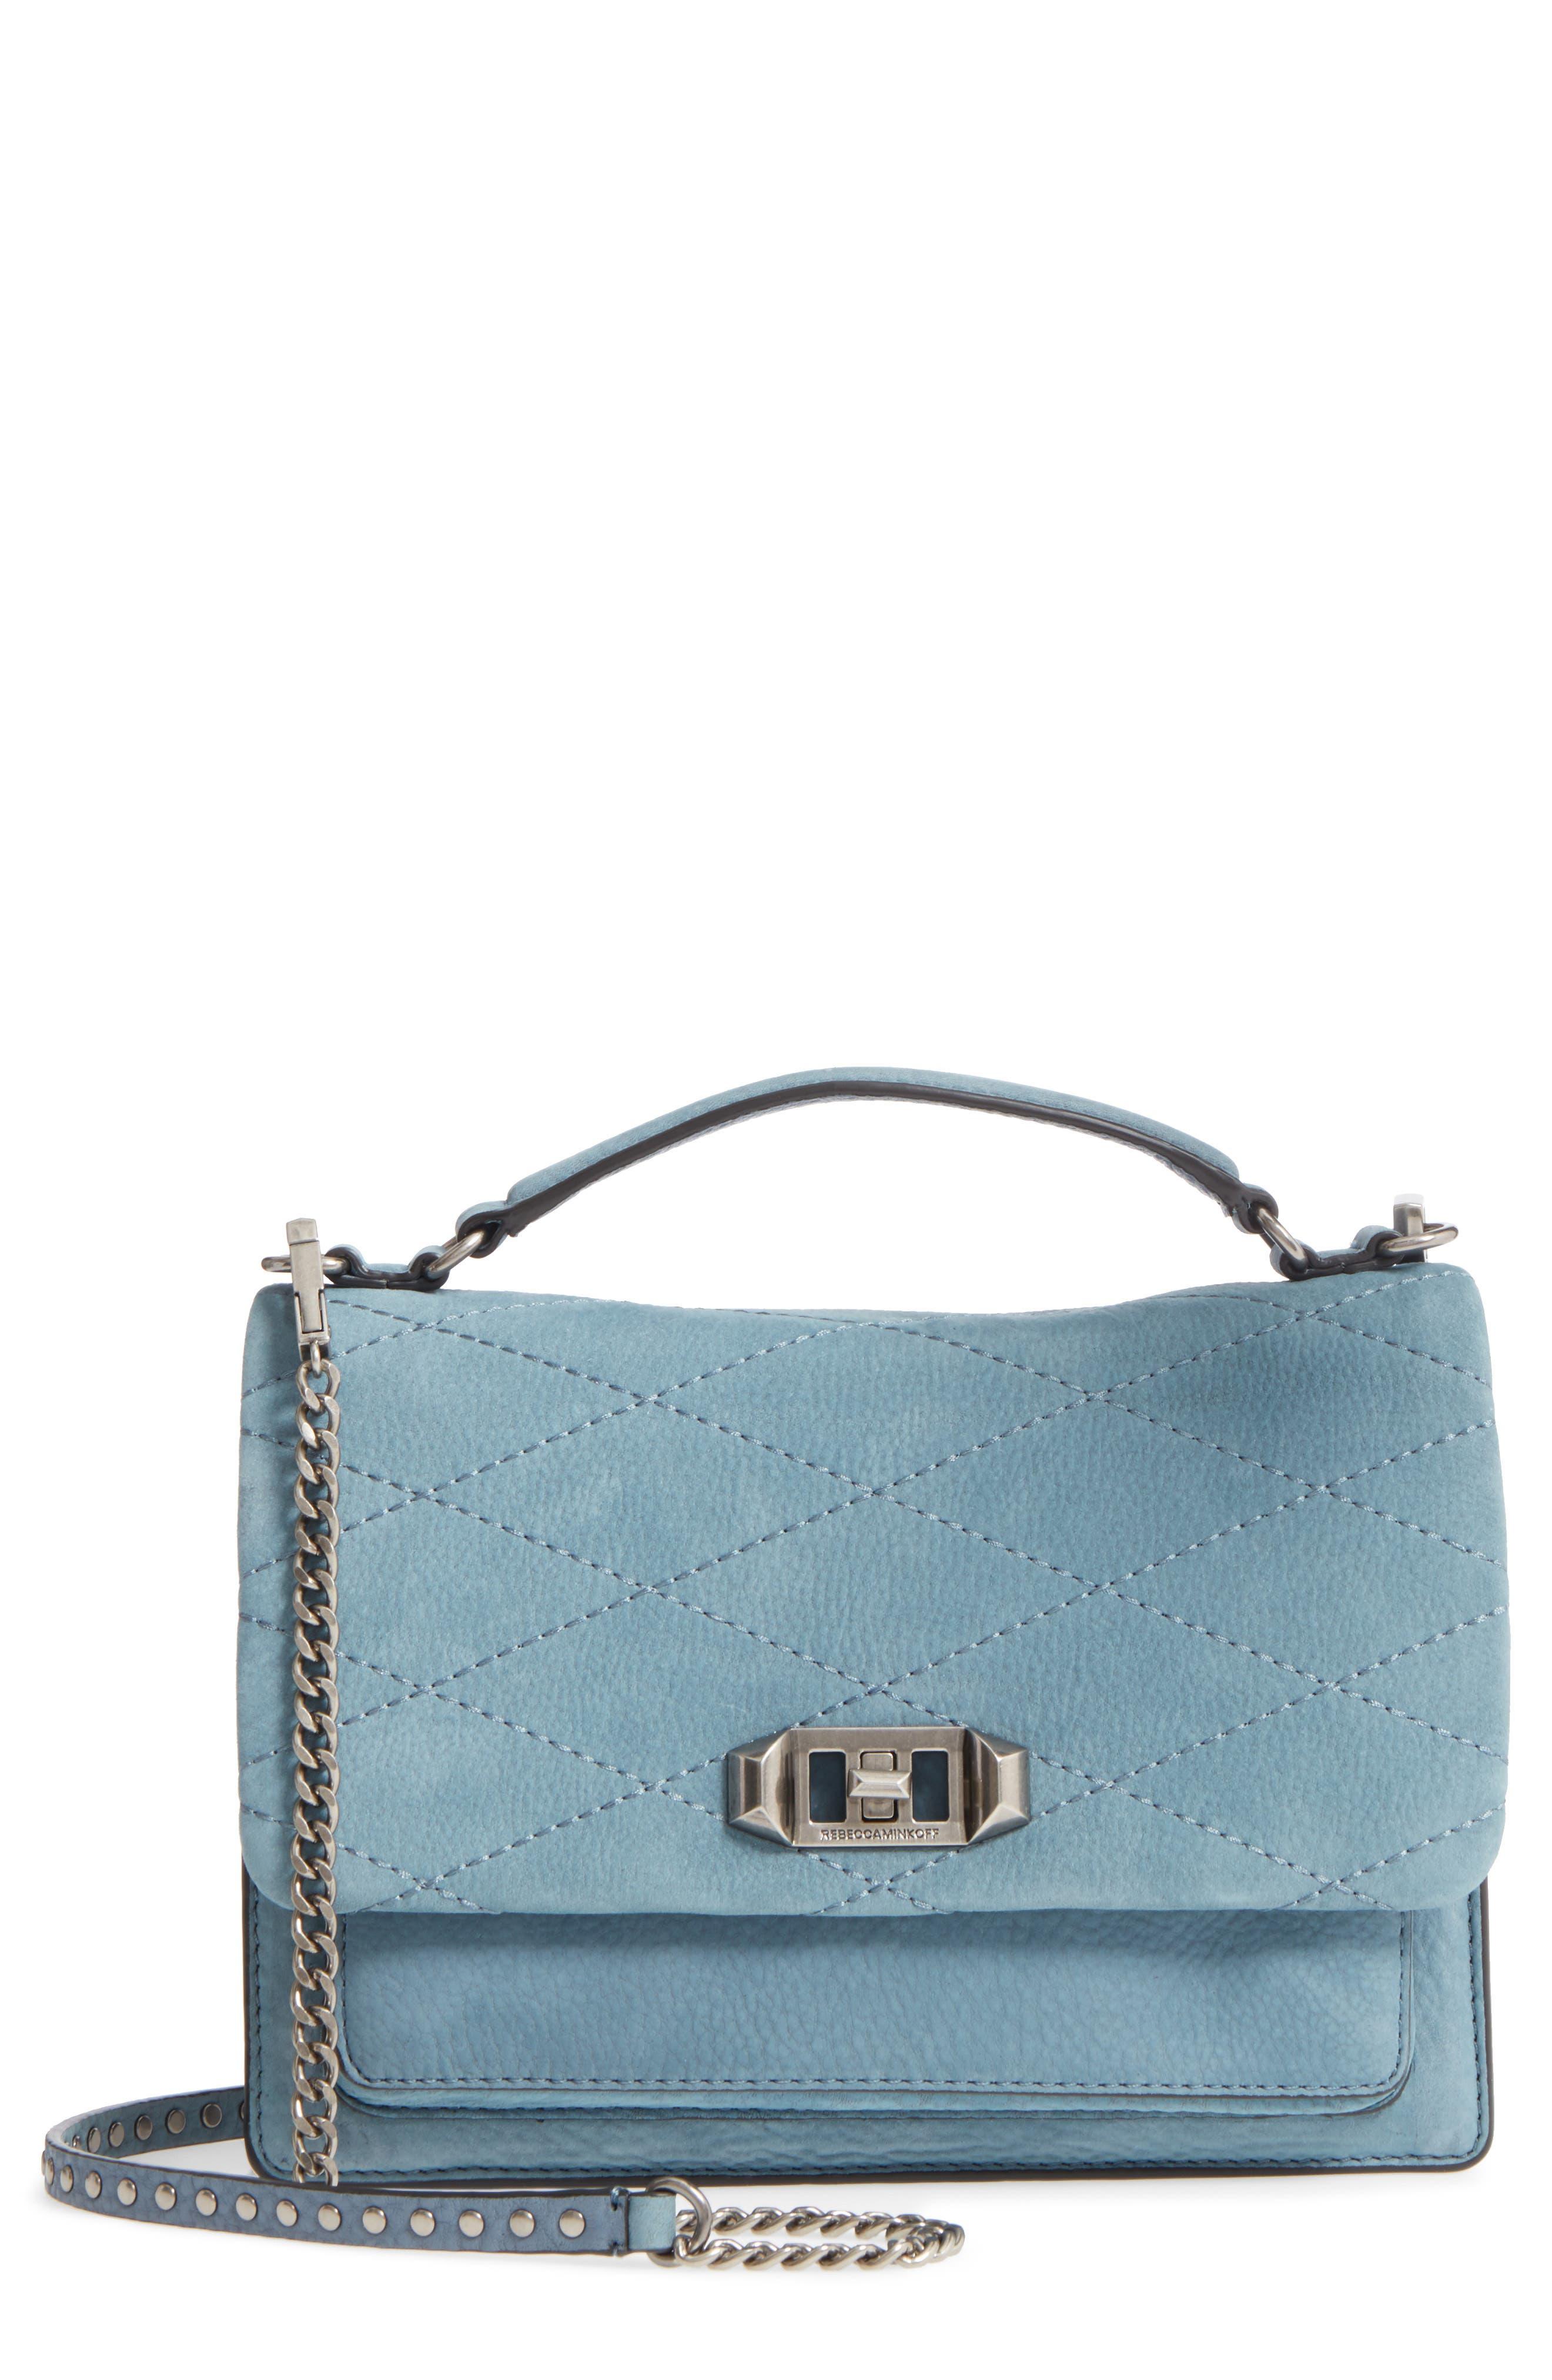 Medium Je T'aime Convertible Leather Crossbody Bag,                             Main thumbnail 5, color,